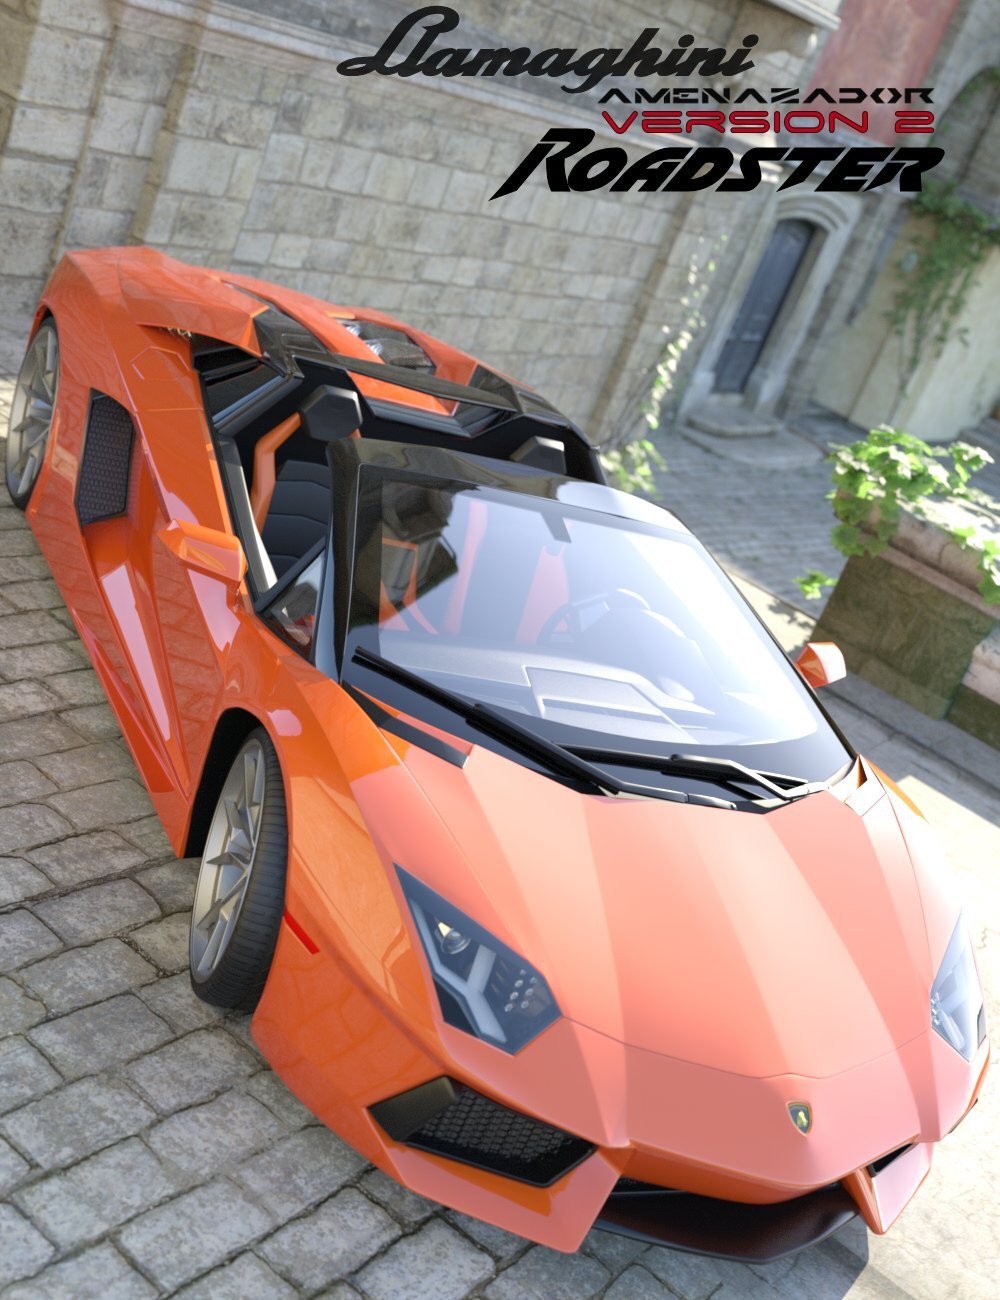 Llamaghini Amenazador Version 2 Roadster by: Mattymanx, 3D Models by Daz 3D